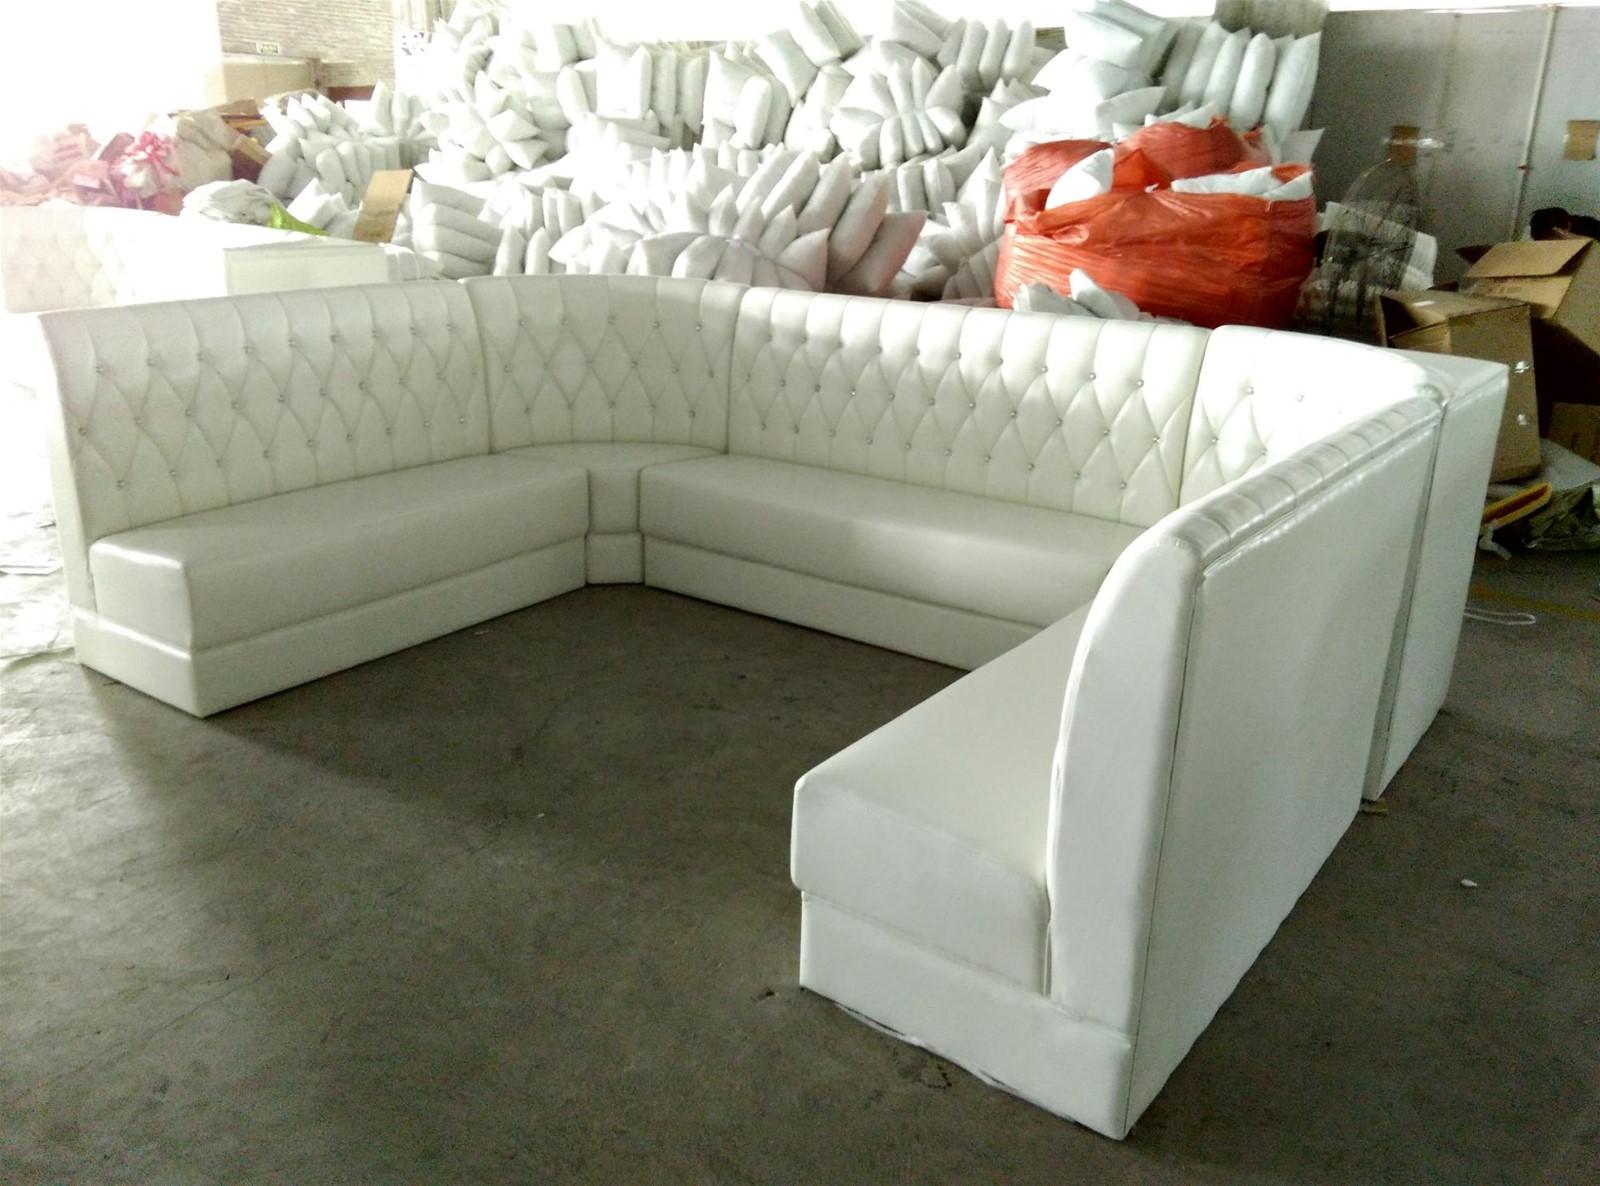 U Shape Customized Restaurant Booth Seating In White Vinyl